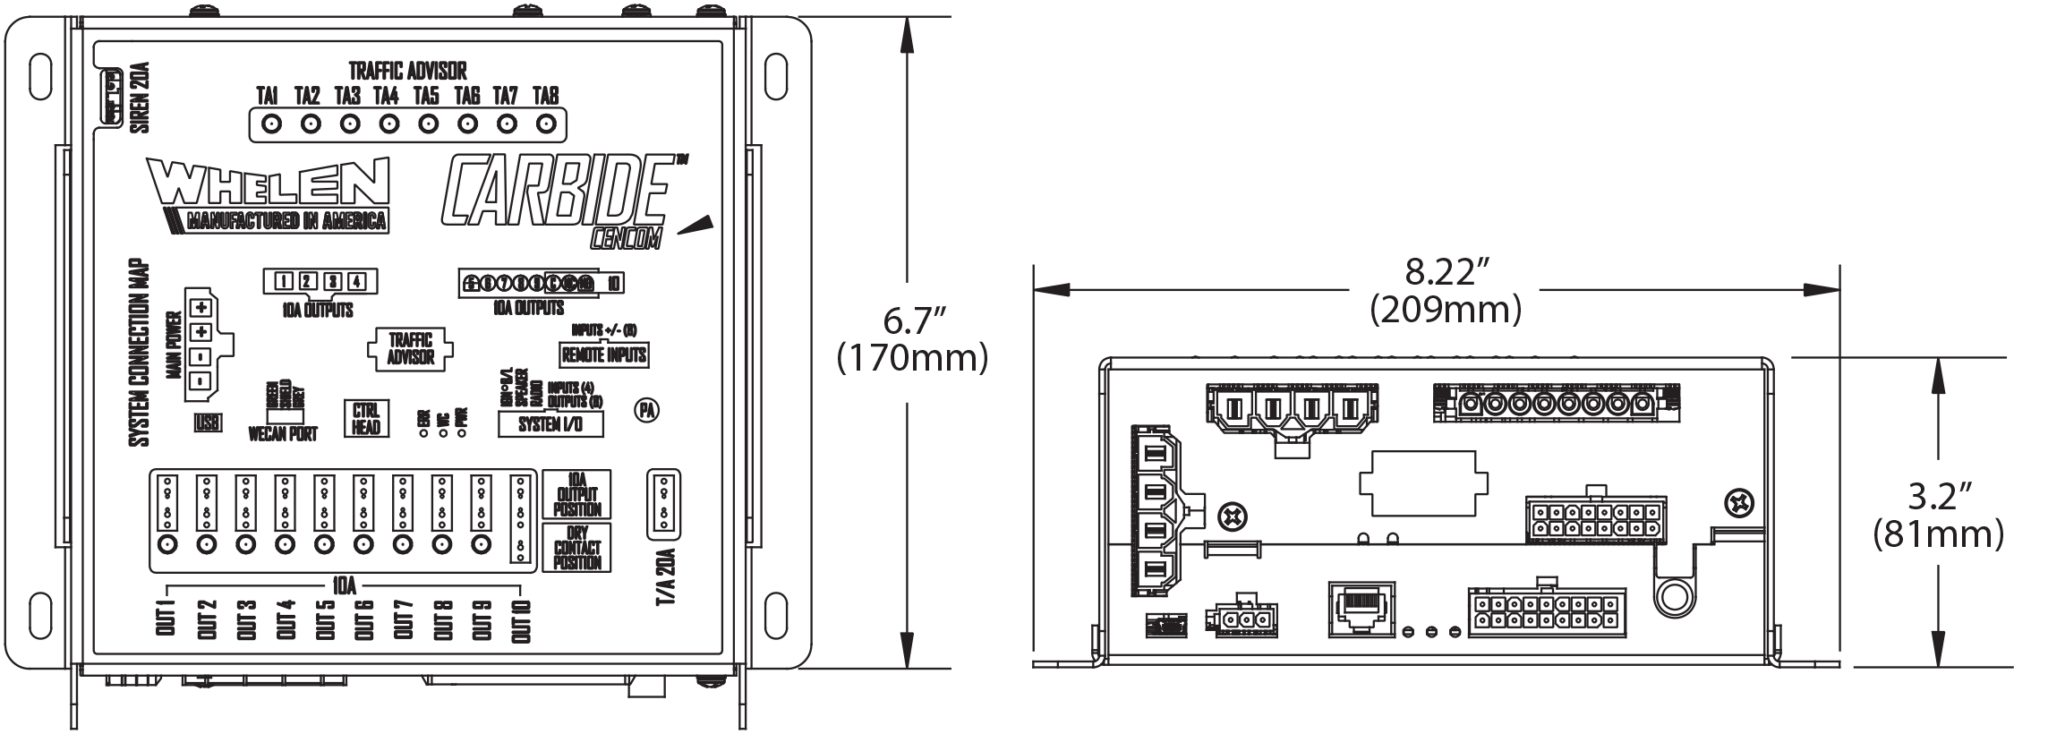 Whelen Cen Com Wiring Diagram